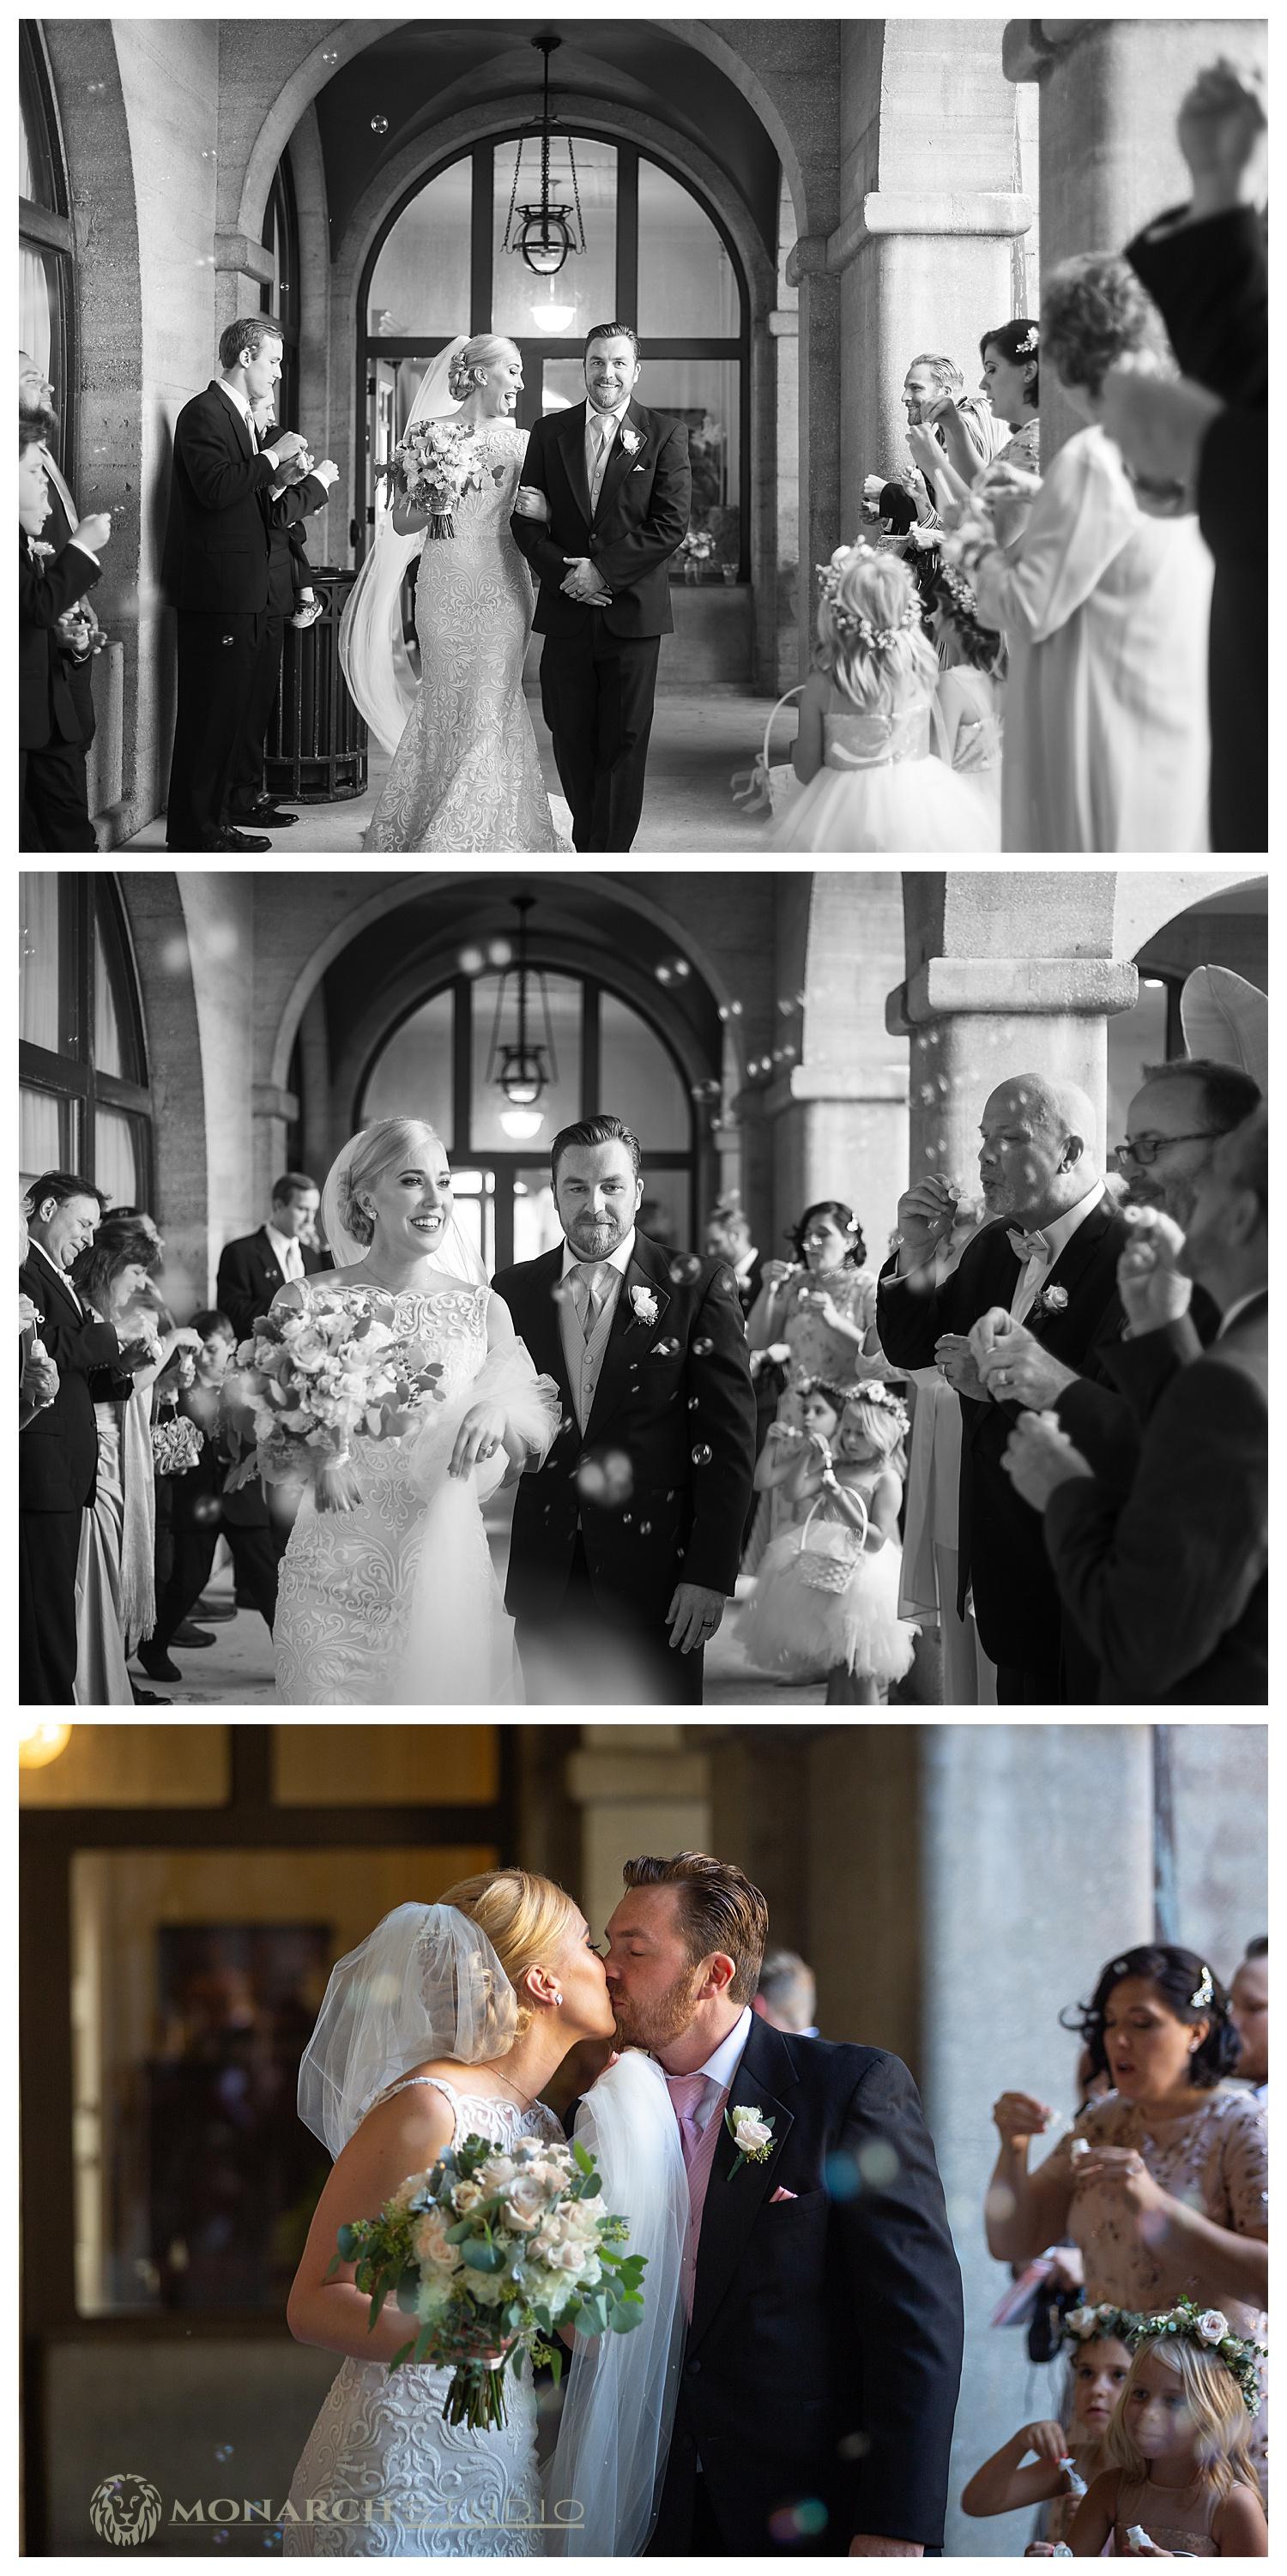 St. Augustine Wedding - Amore Wedding Chapel - 044.JPG